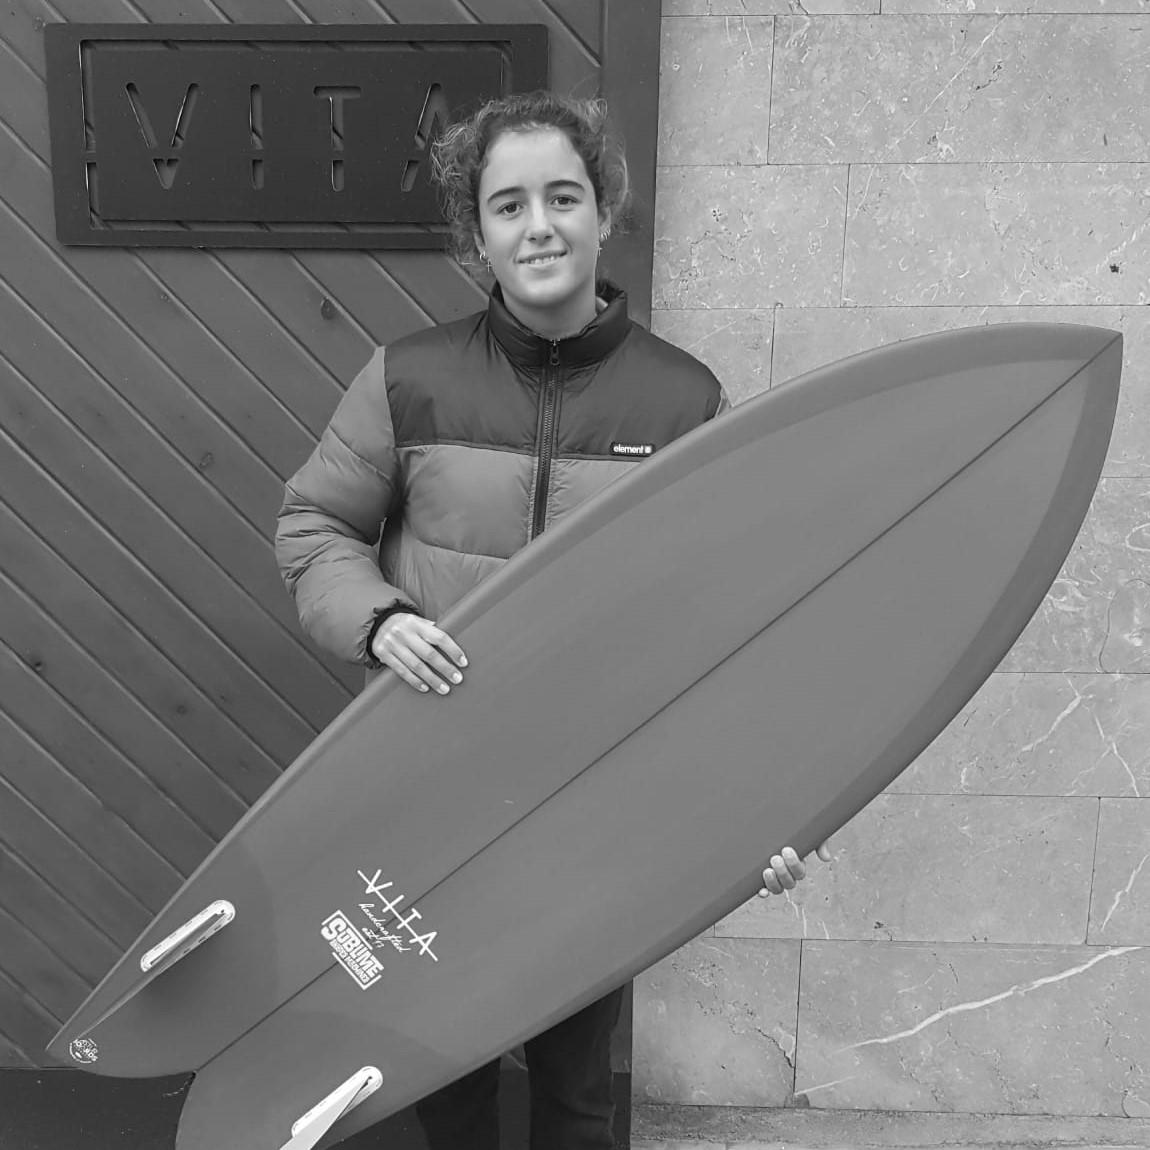 Daniela, surf para niños